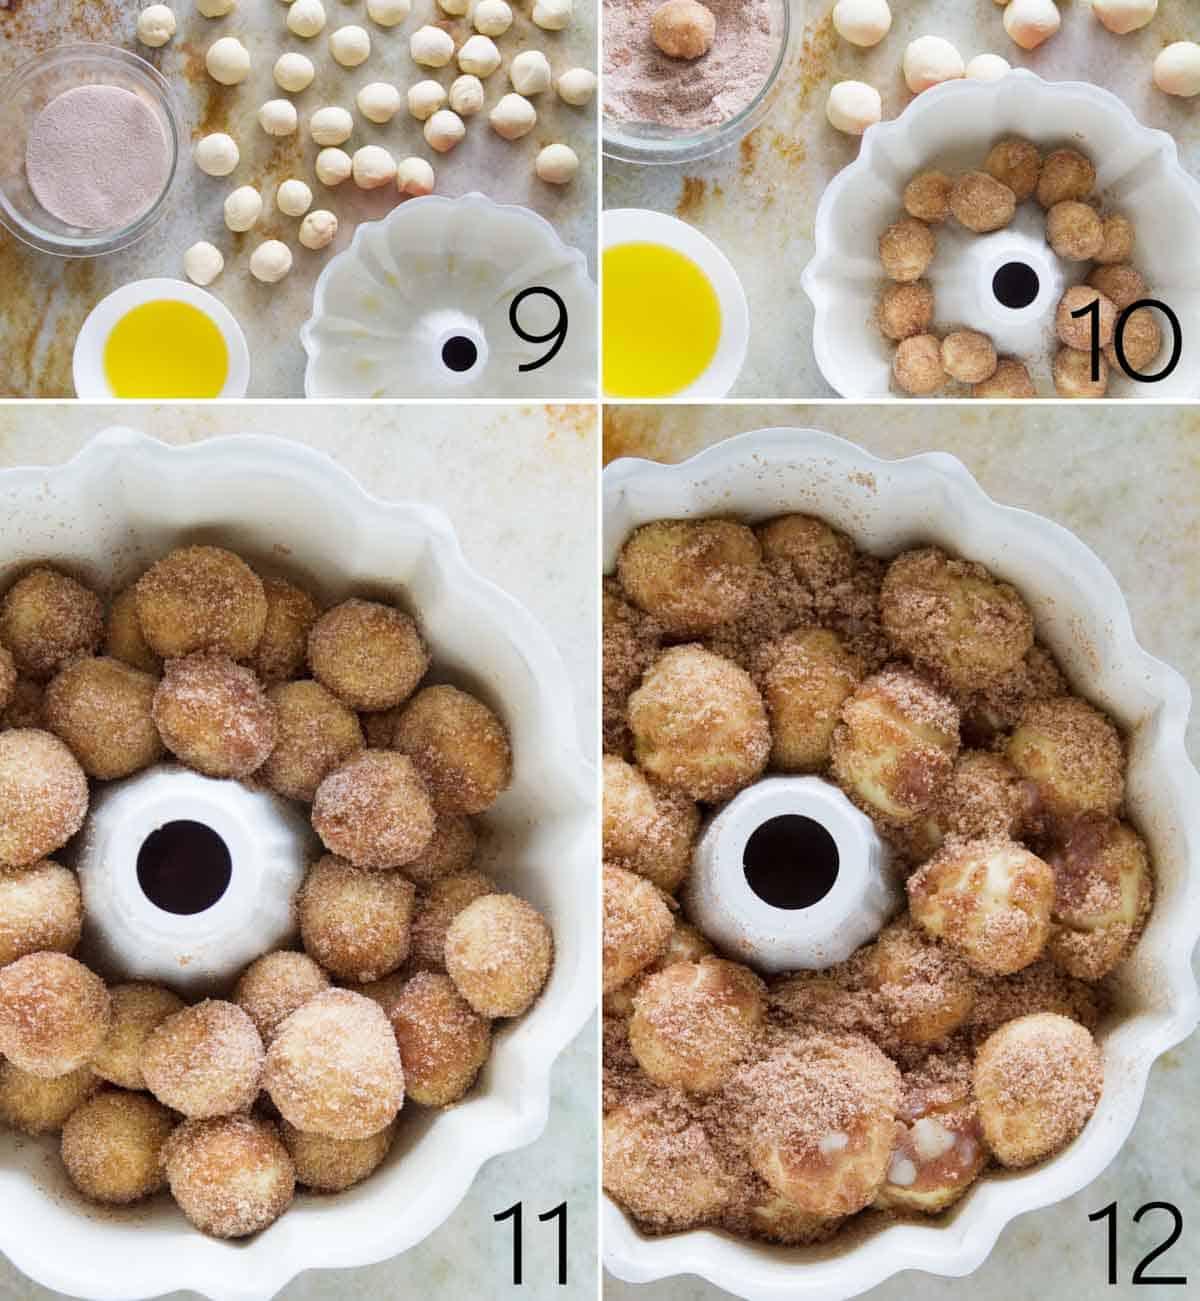 steps to make monkey bread